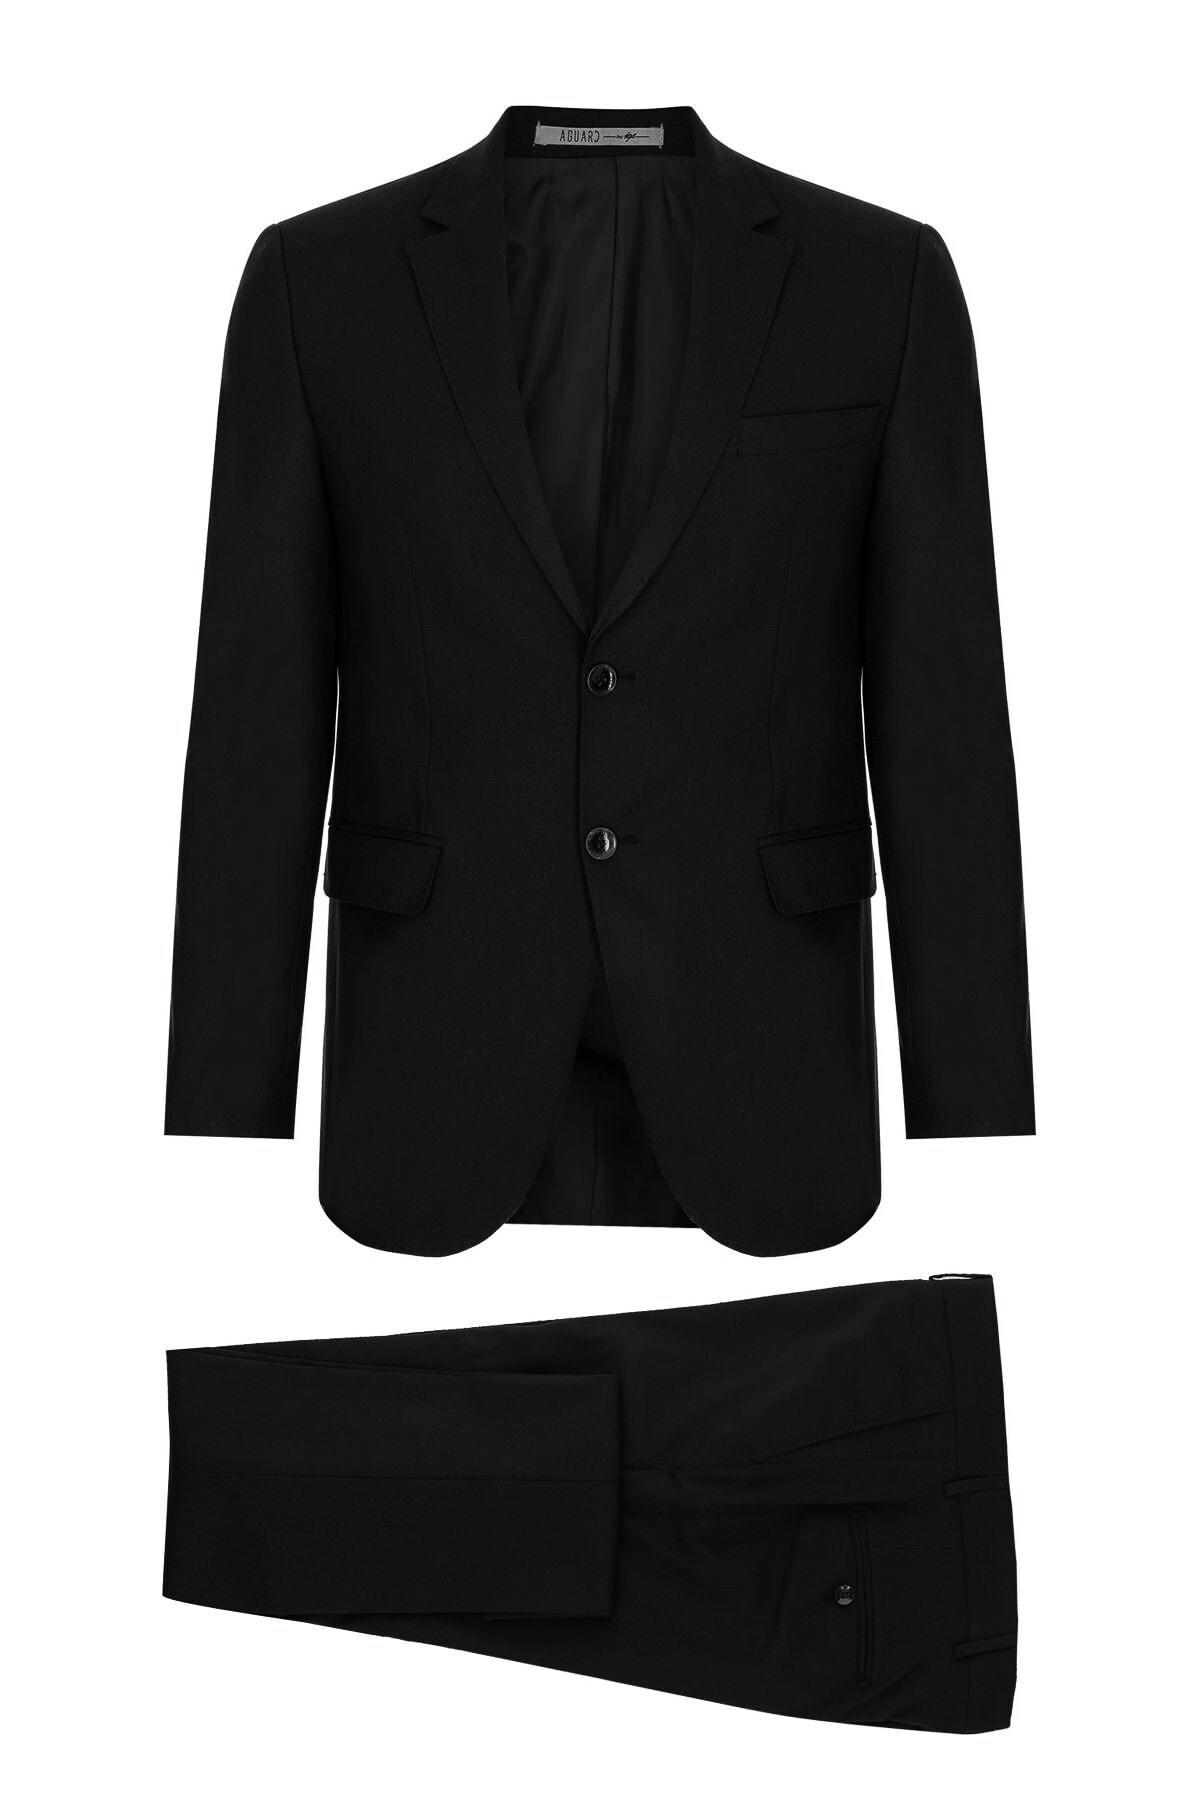 İgs Erkek Siyah Regularfıt / Rahat Kalıp Std Takım Elbise 1